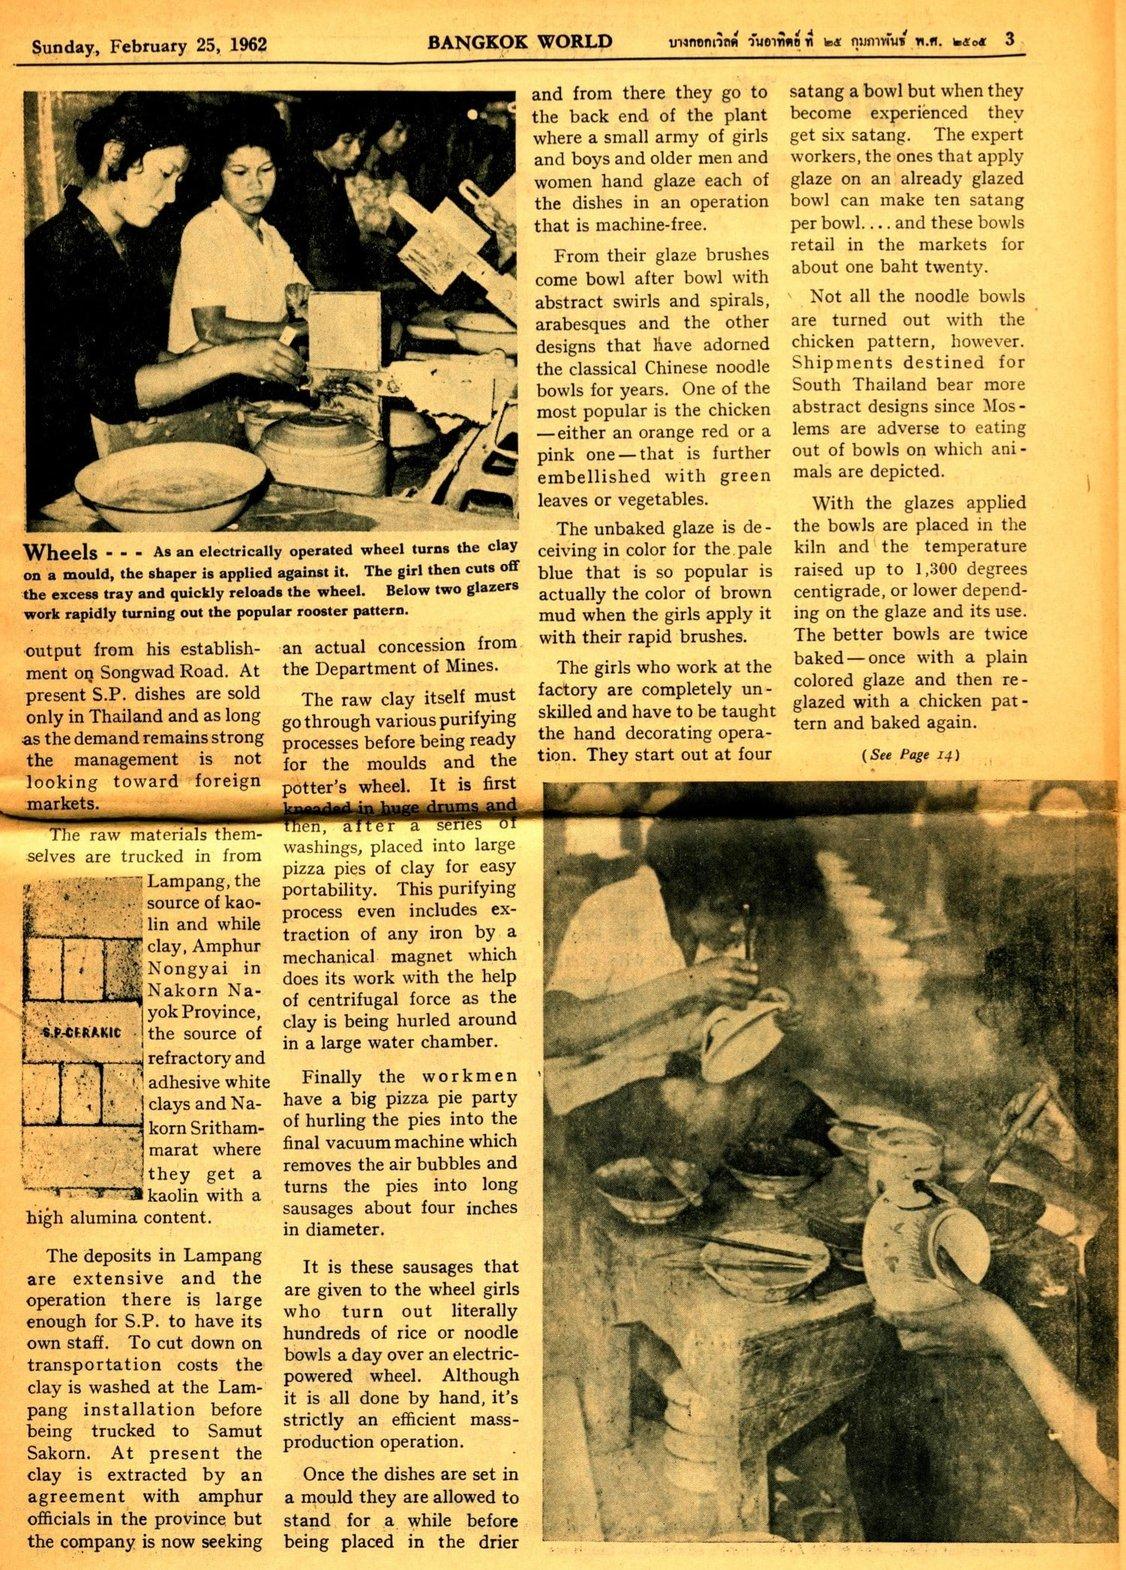 Bangkok World, February 25, 1962